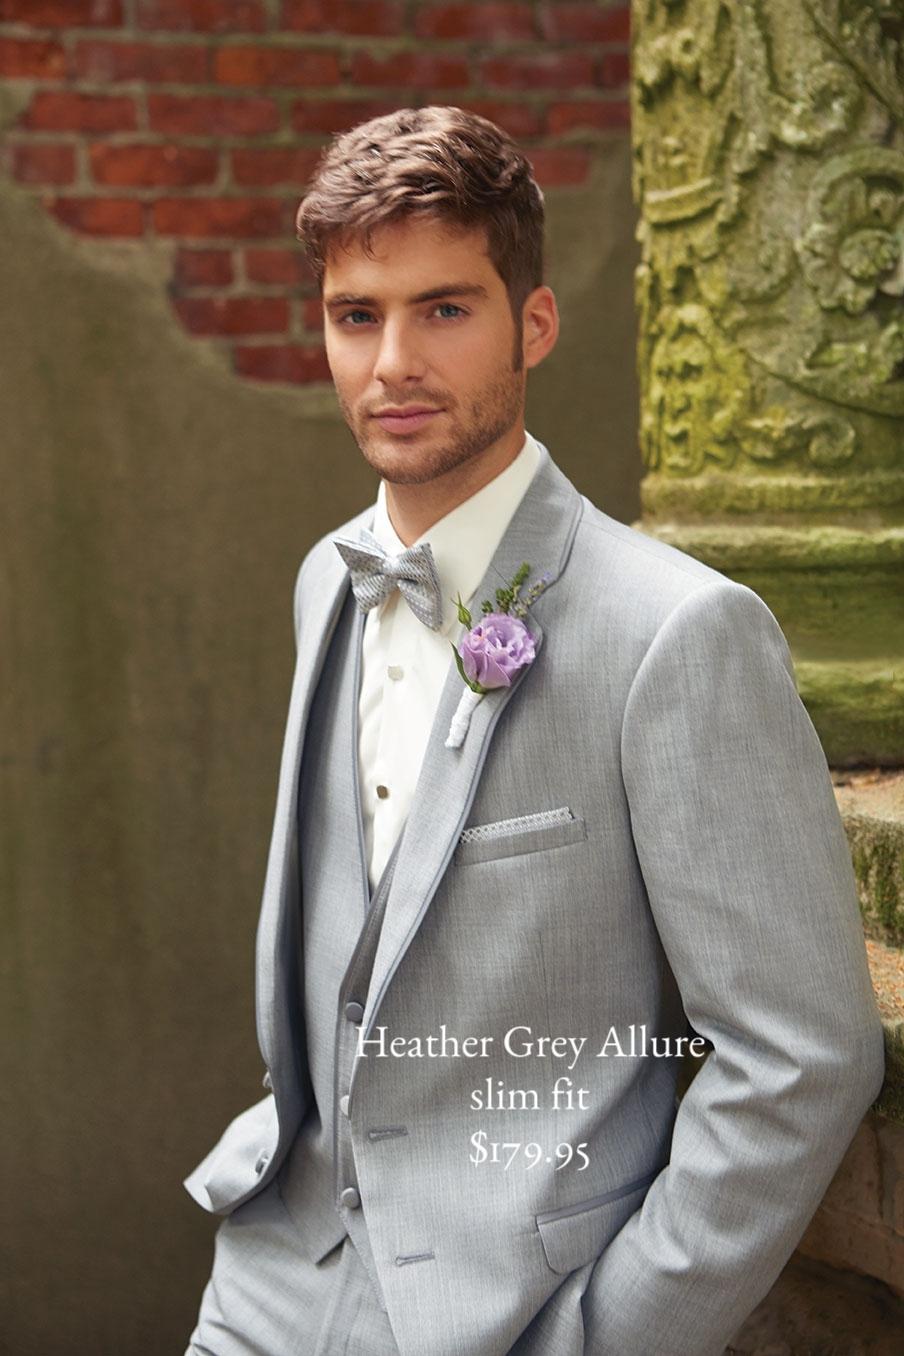 heather grey allure .jpg